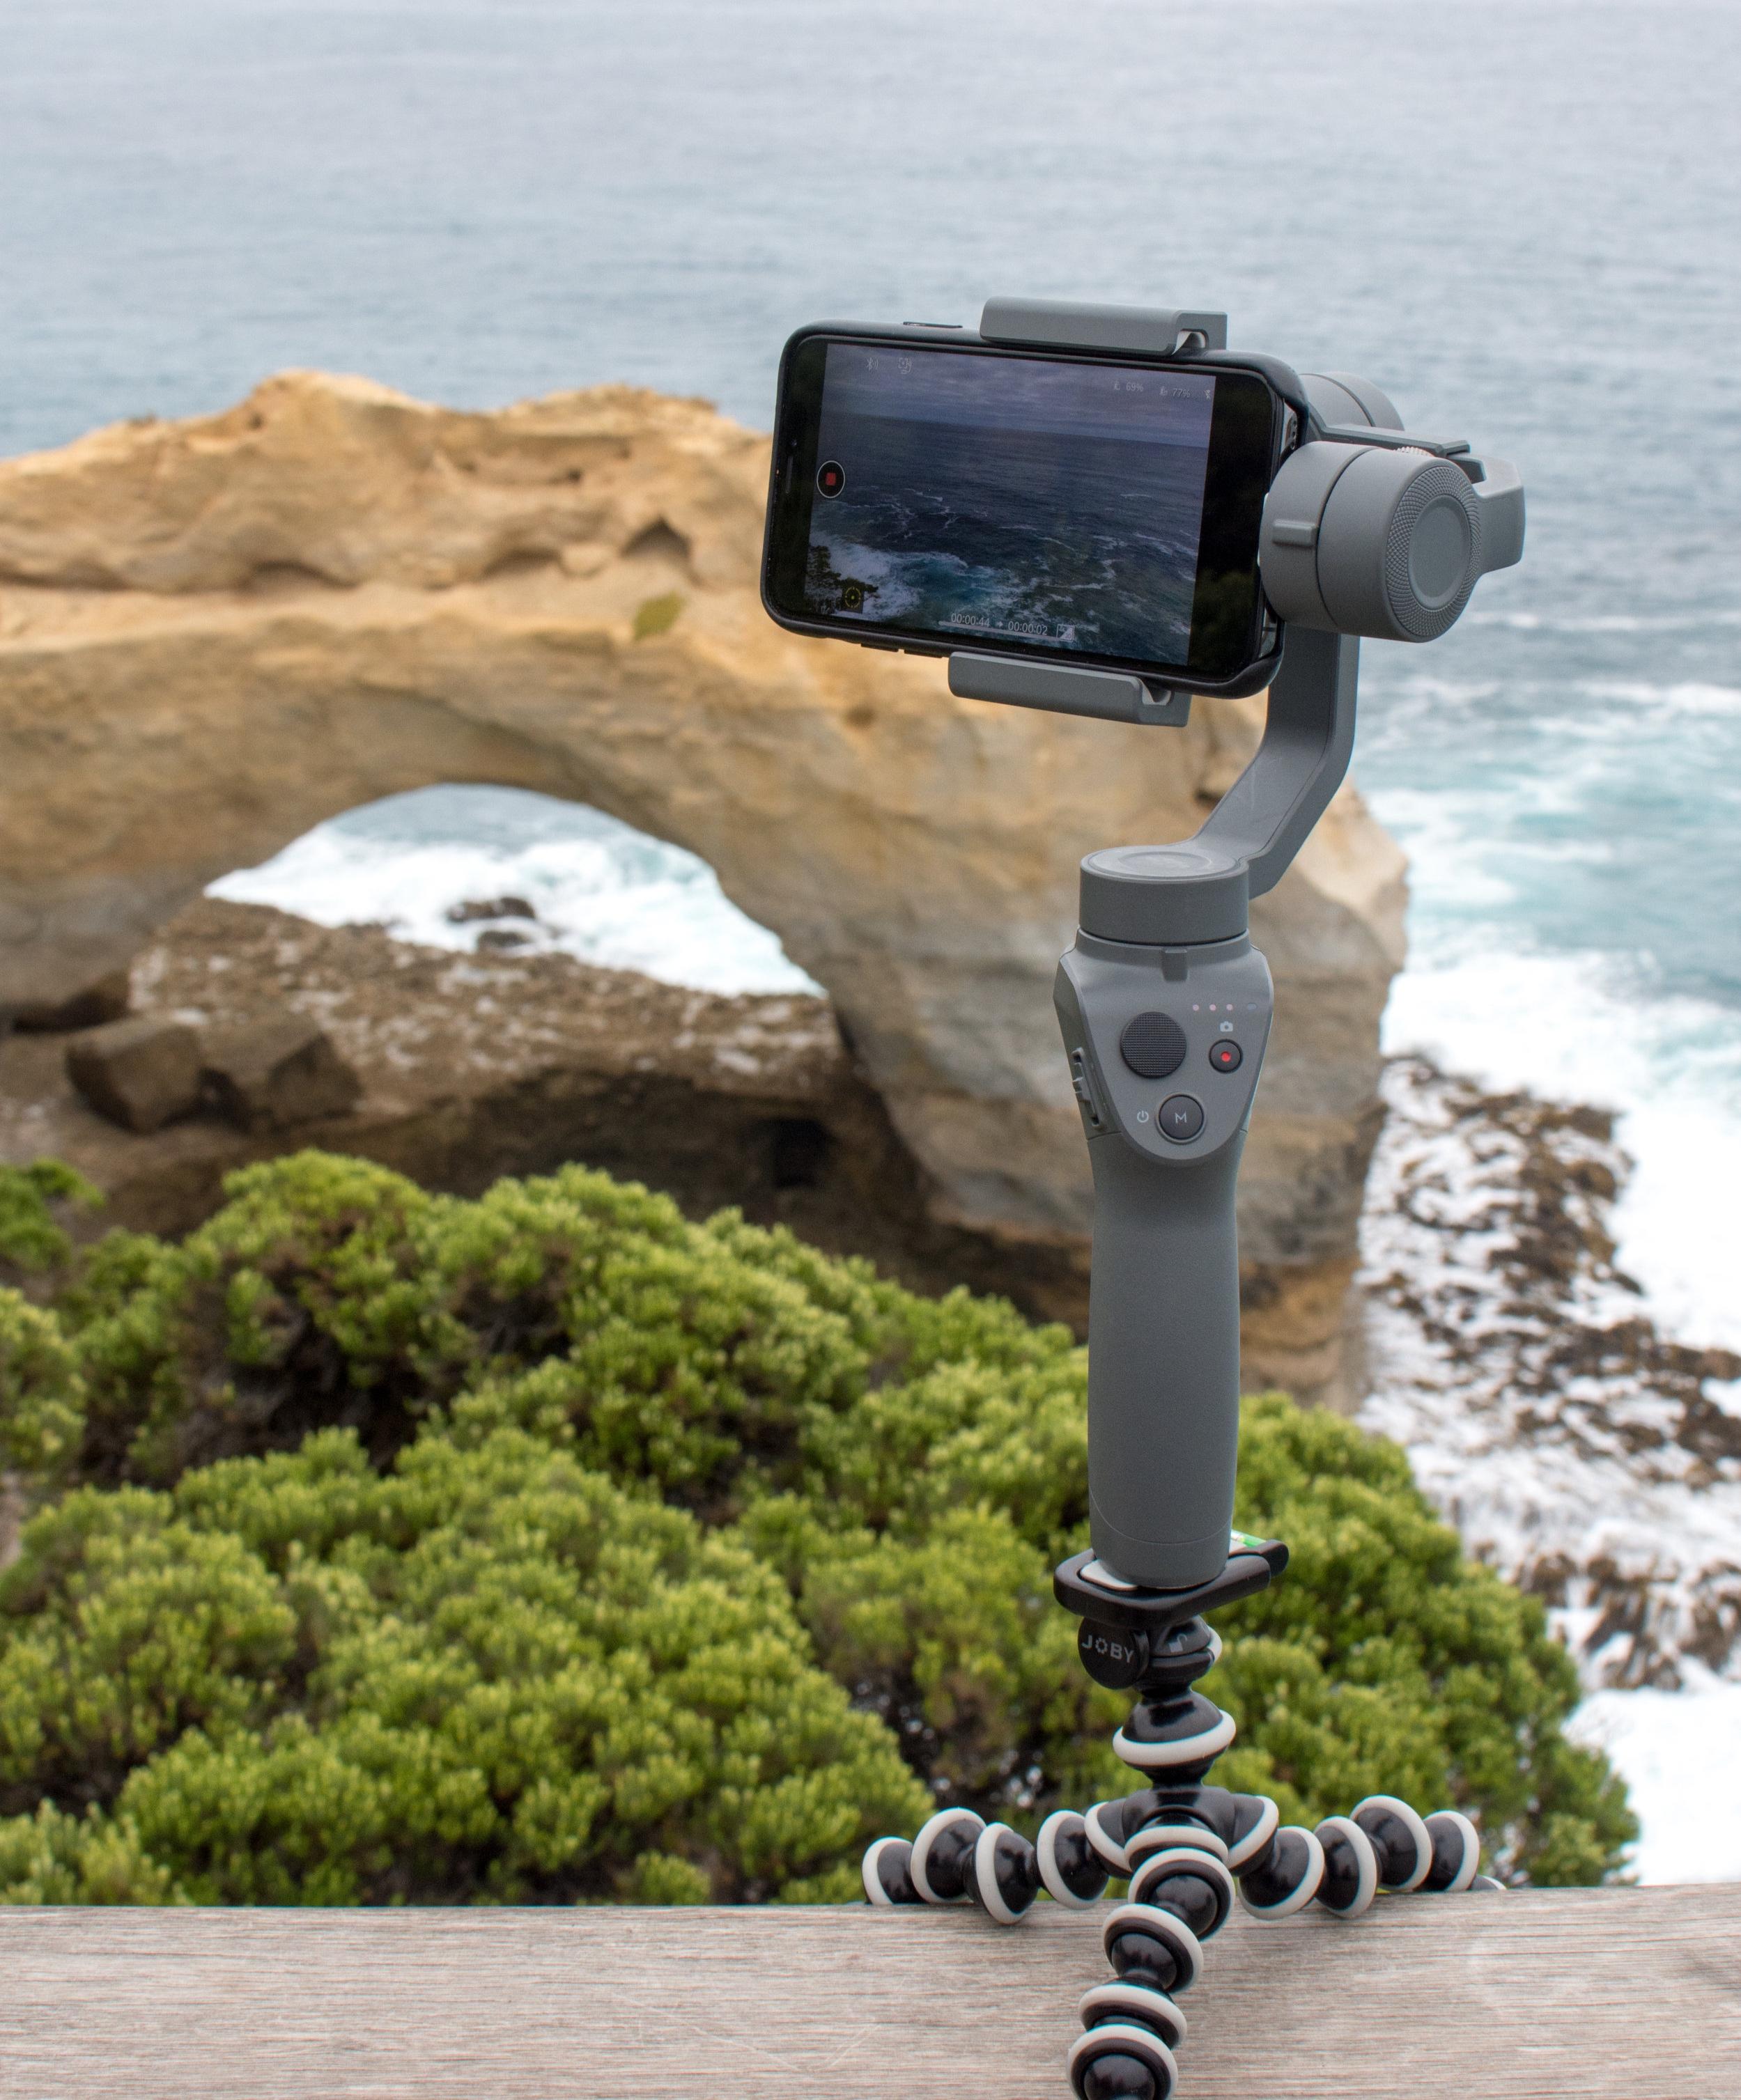 DJI Osmo Mobile 2 on the Great Ocean Road, Australia